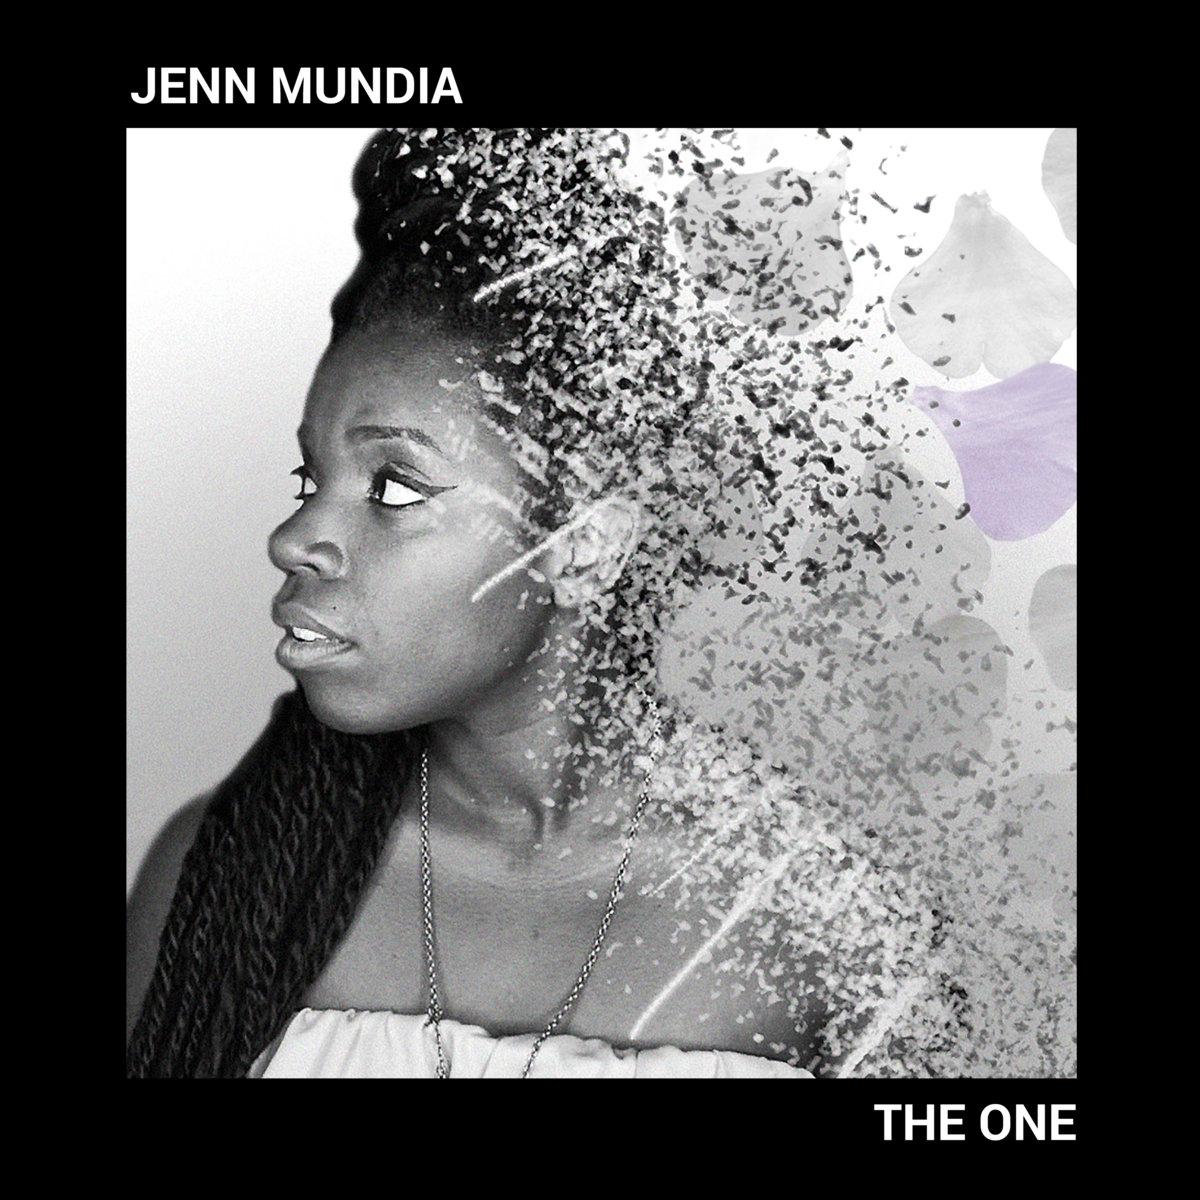 The One | Jenn Mundia